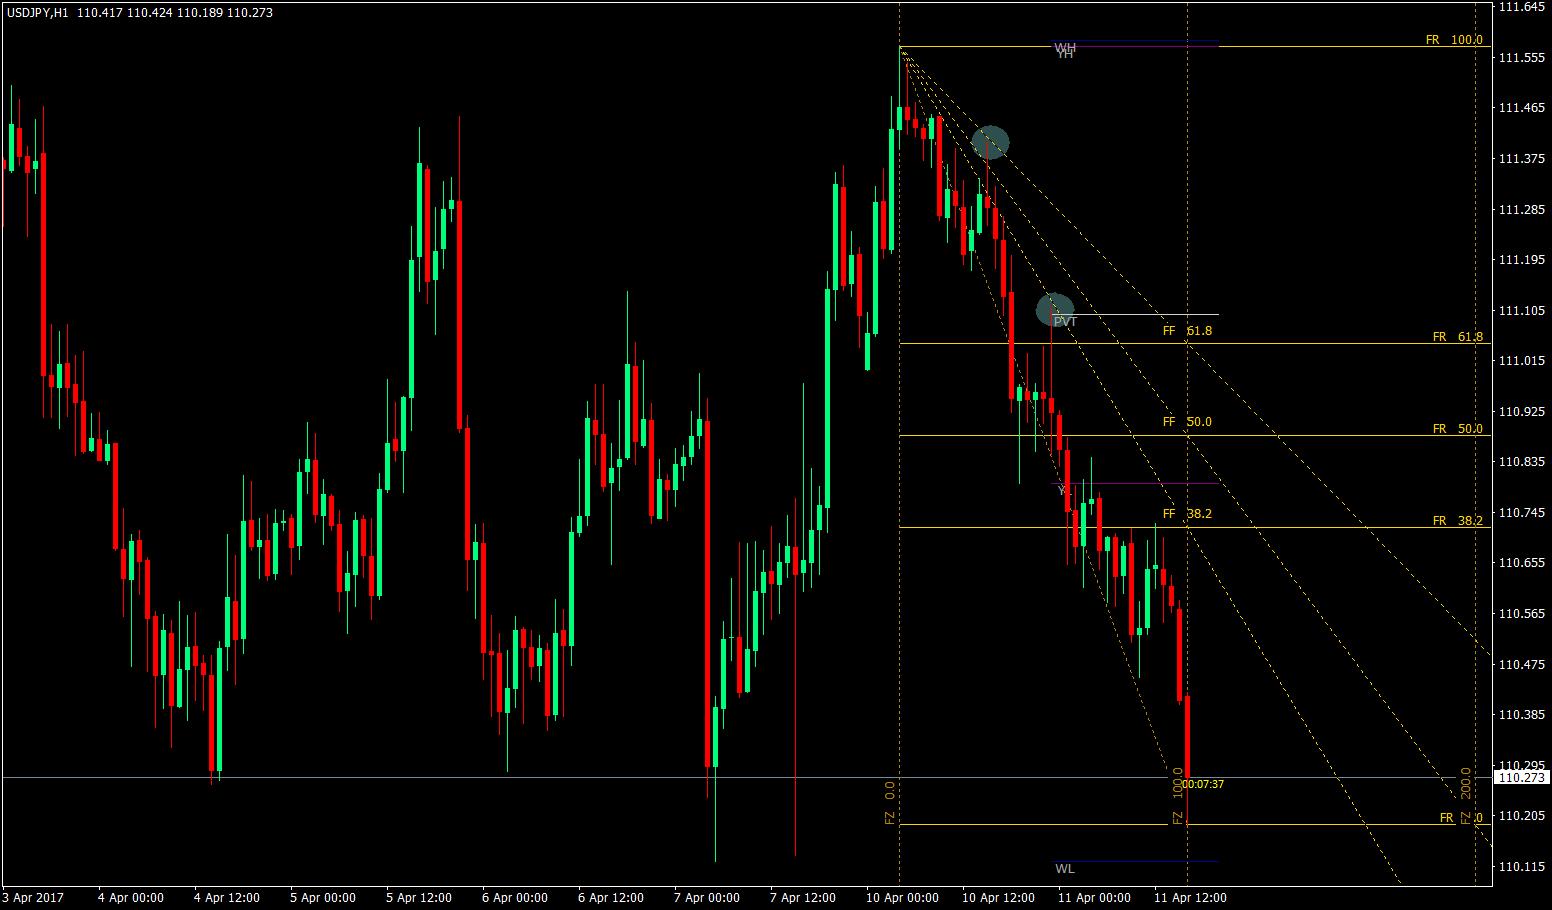 Fibonacci trading indicators